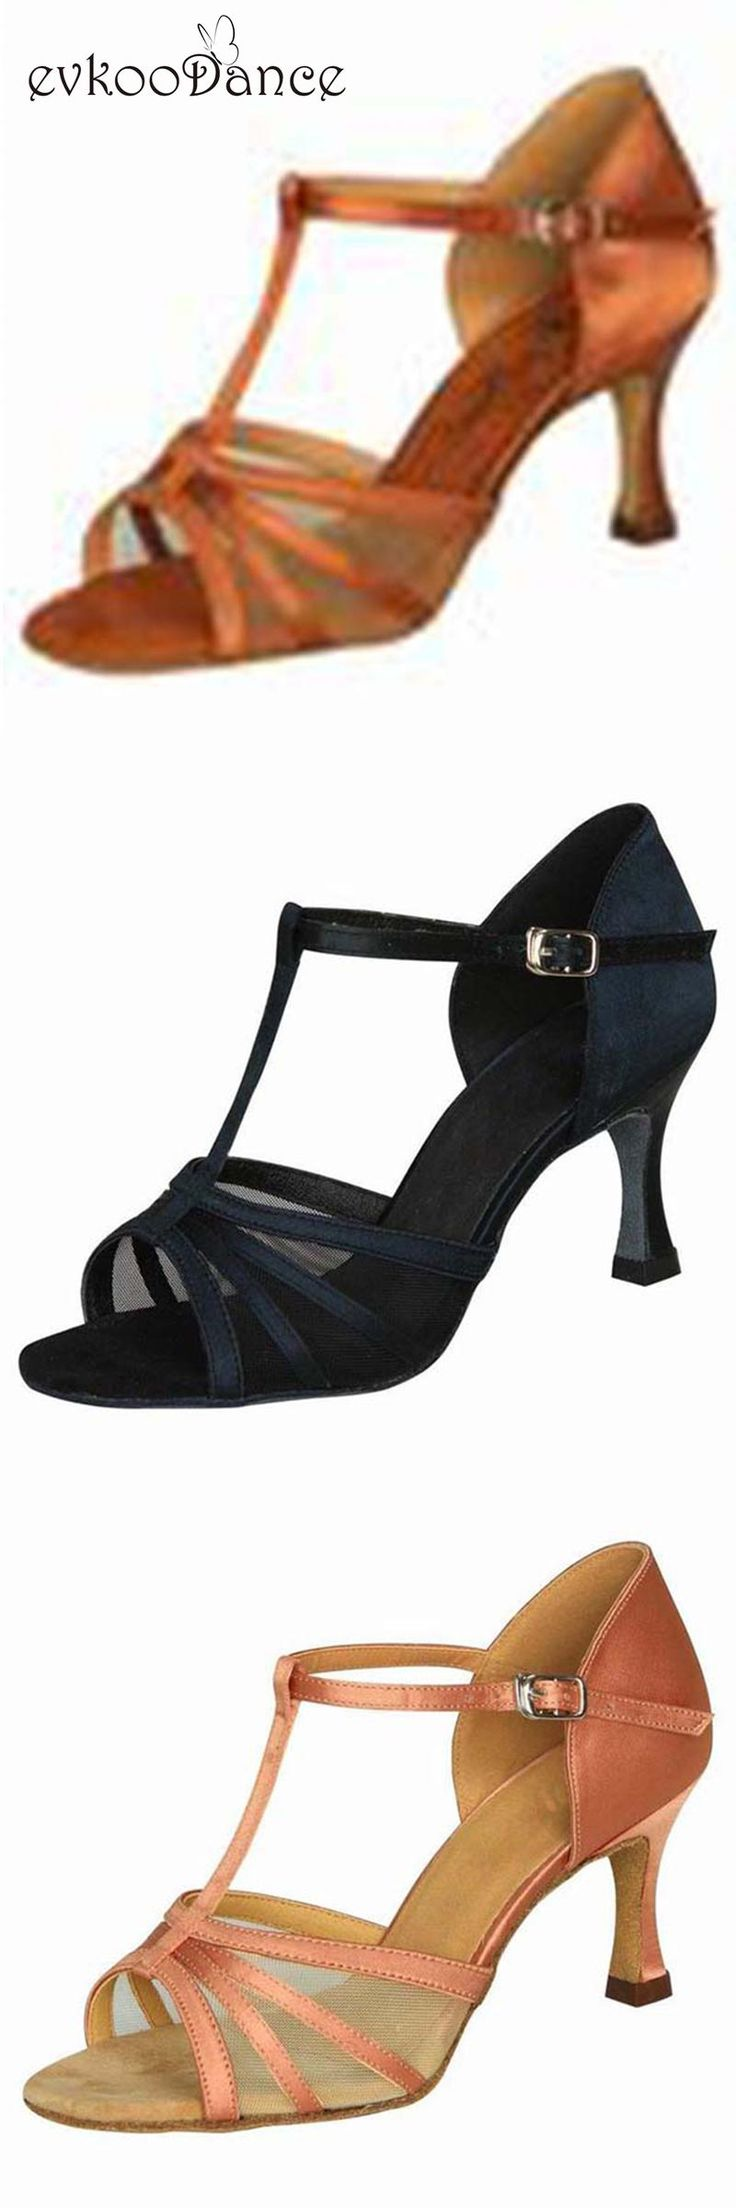 [Visit to Buy] Zapatos De Baile Heel Height 7cm Size US 4-12 Tan Black Brown Comfortable Women Salsa Shoes For Dance Shoes Latin NL062  #Advertisement